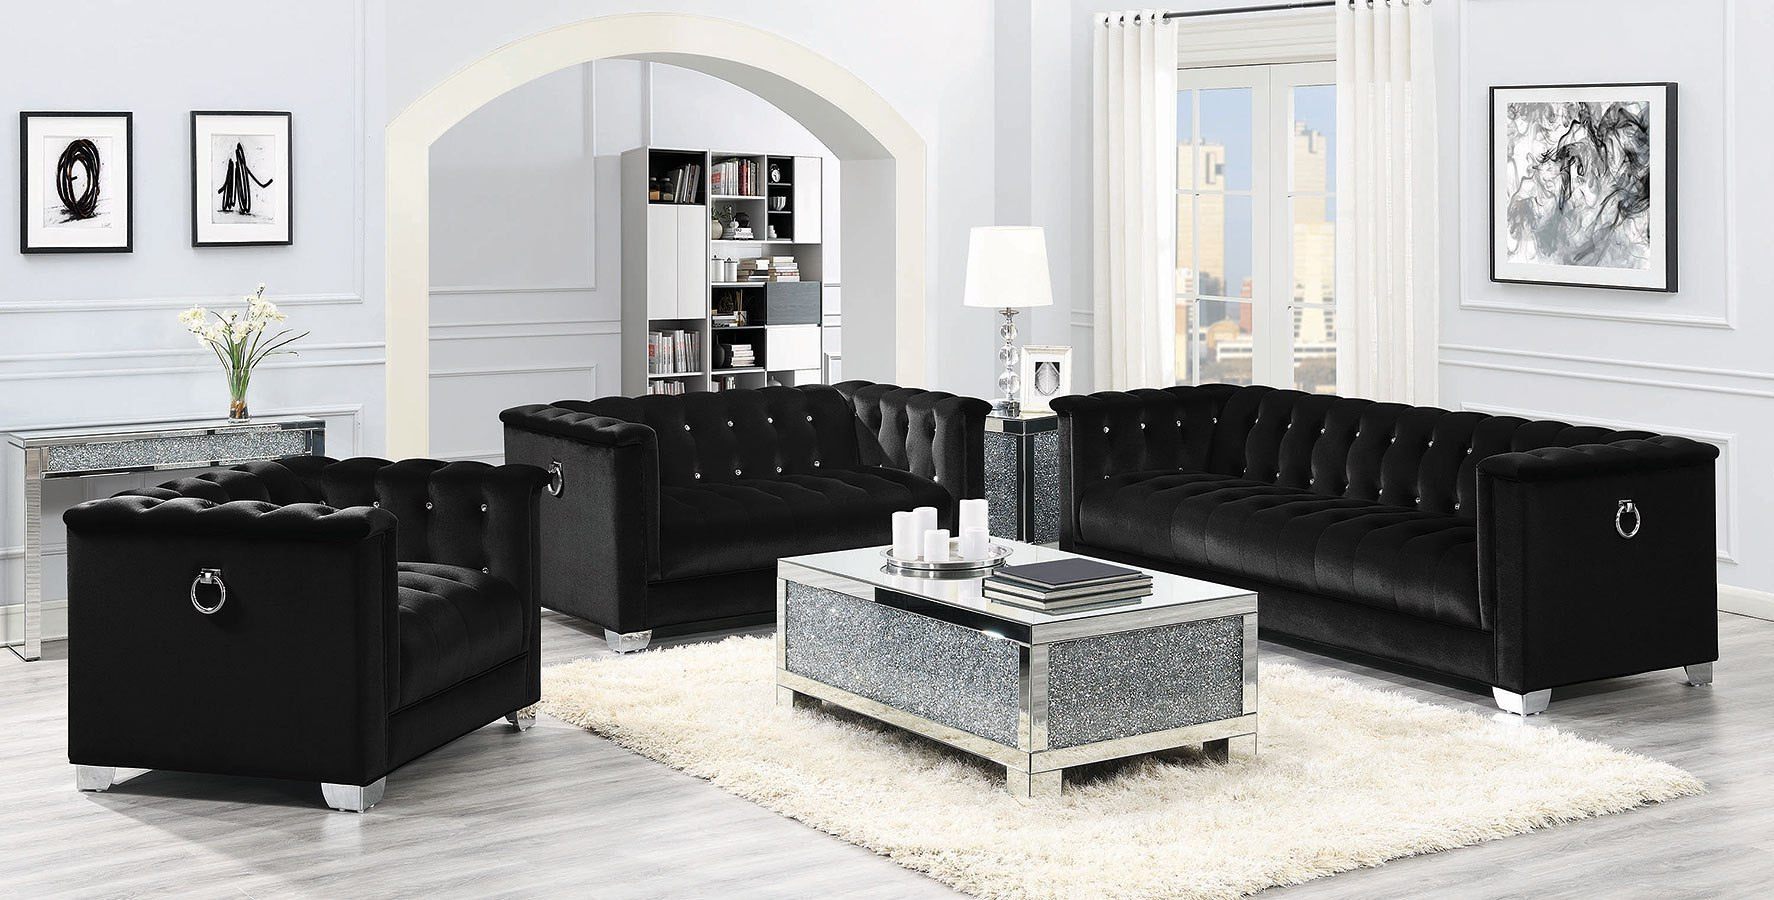 Chaviano Living Room Set (Black)